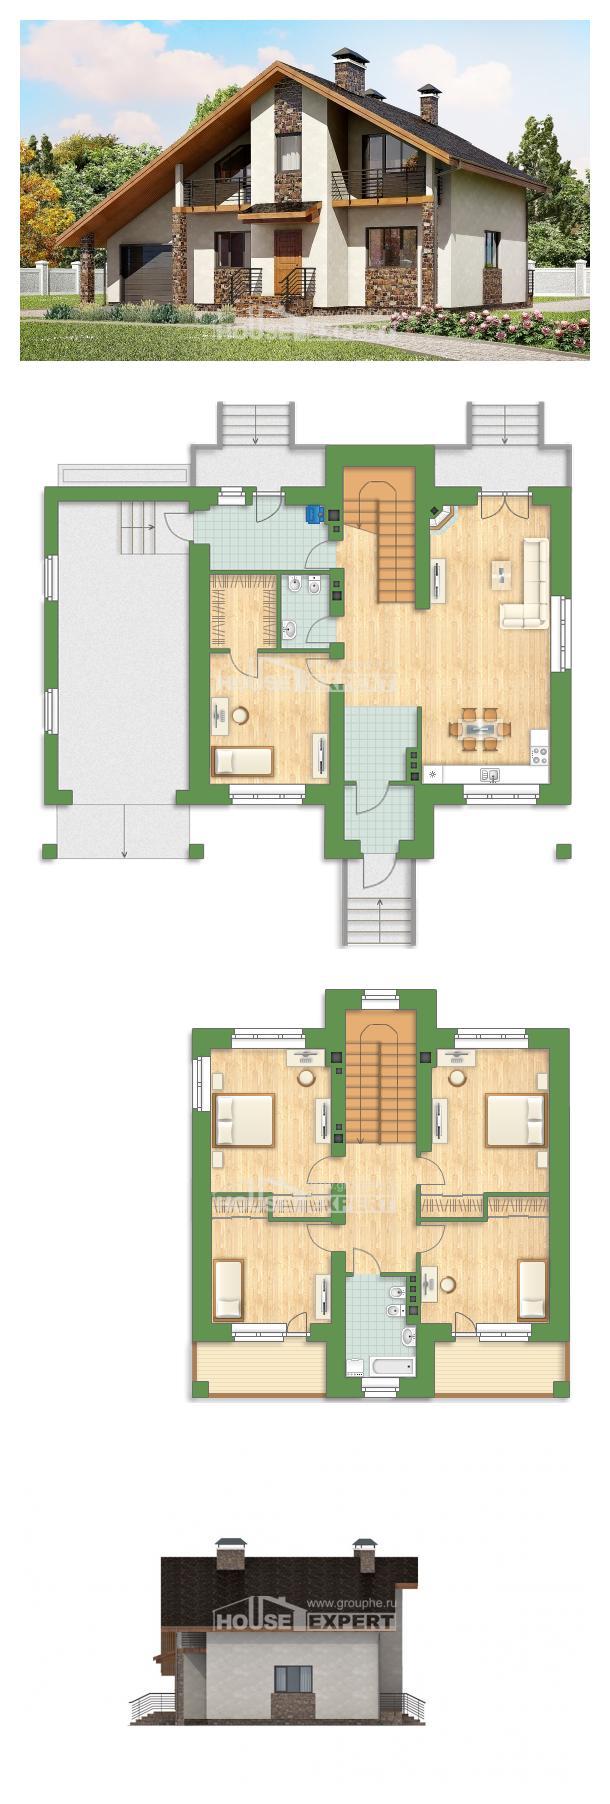 Проект дома 180-008-Л | House Expert